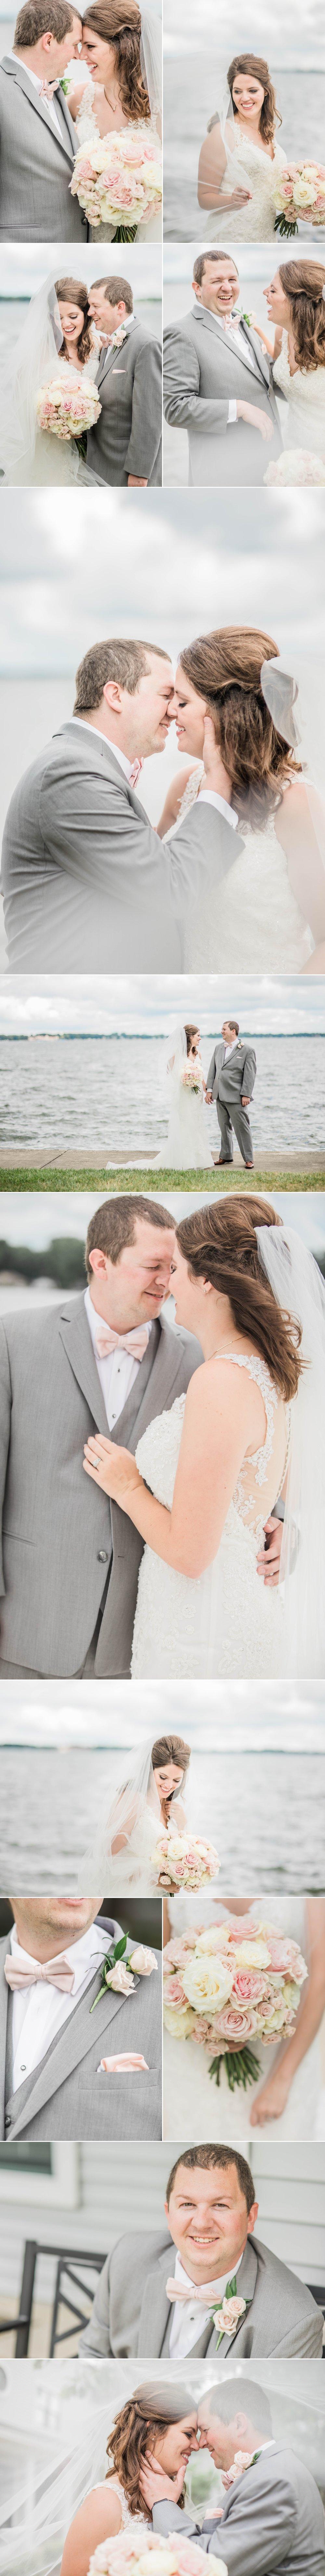 lake wawasee oakwood resort wedding indiana bride groom portraits pier